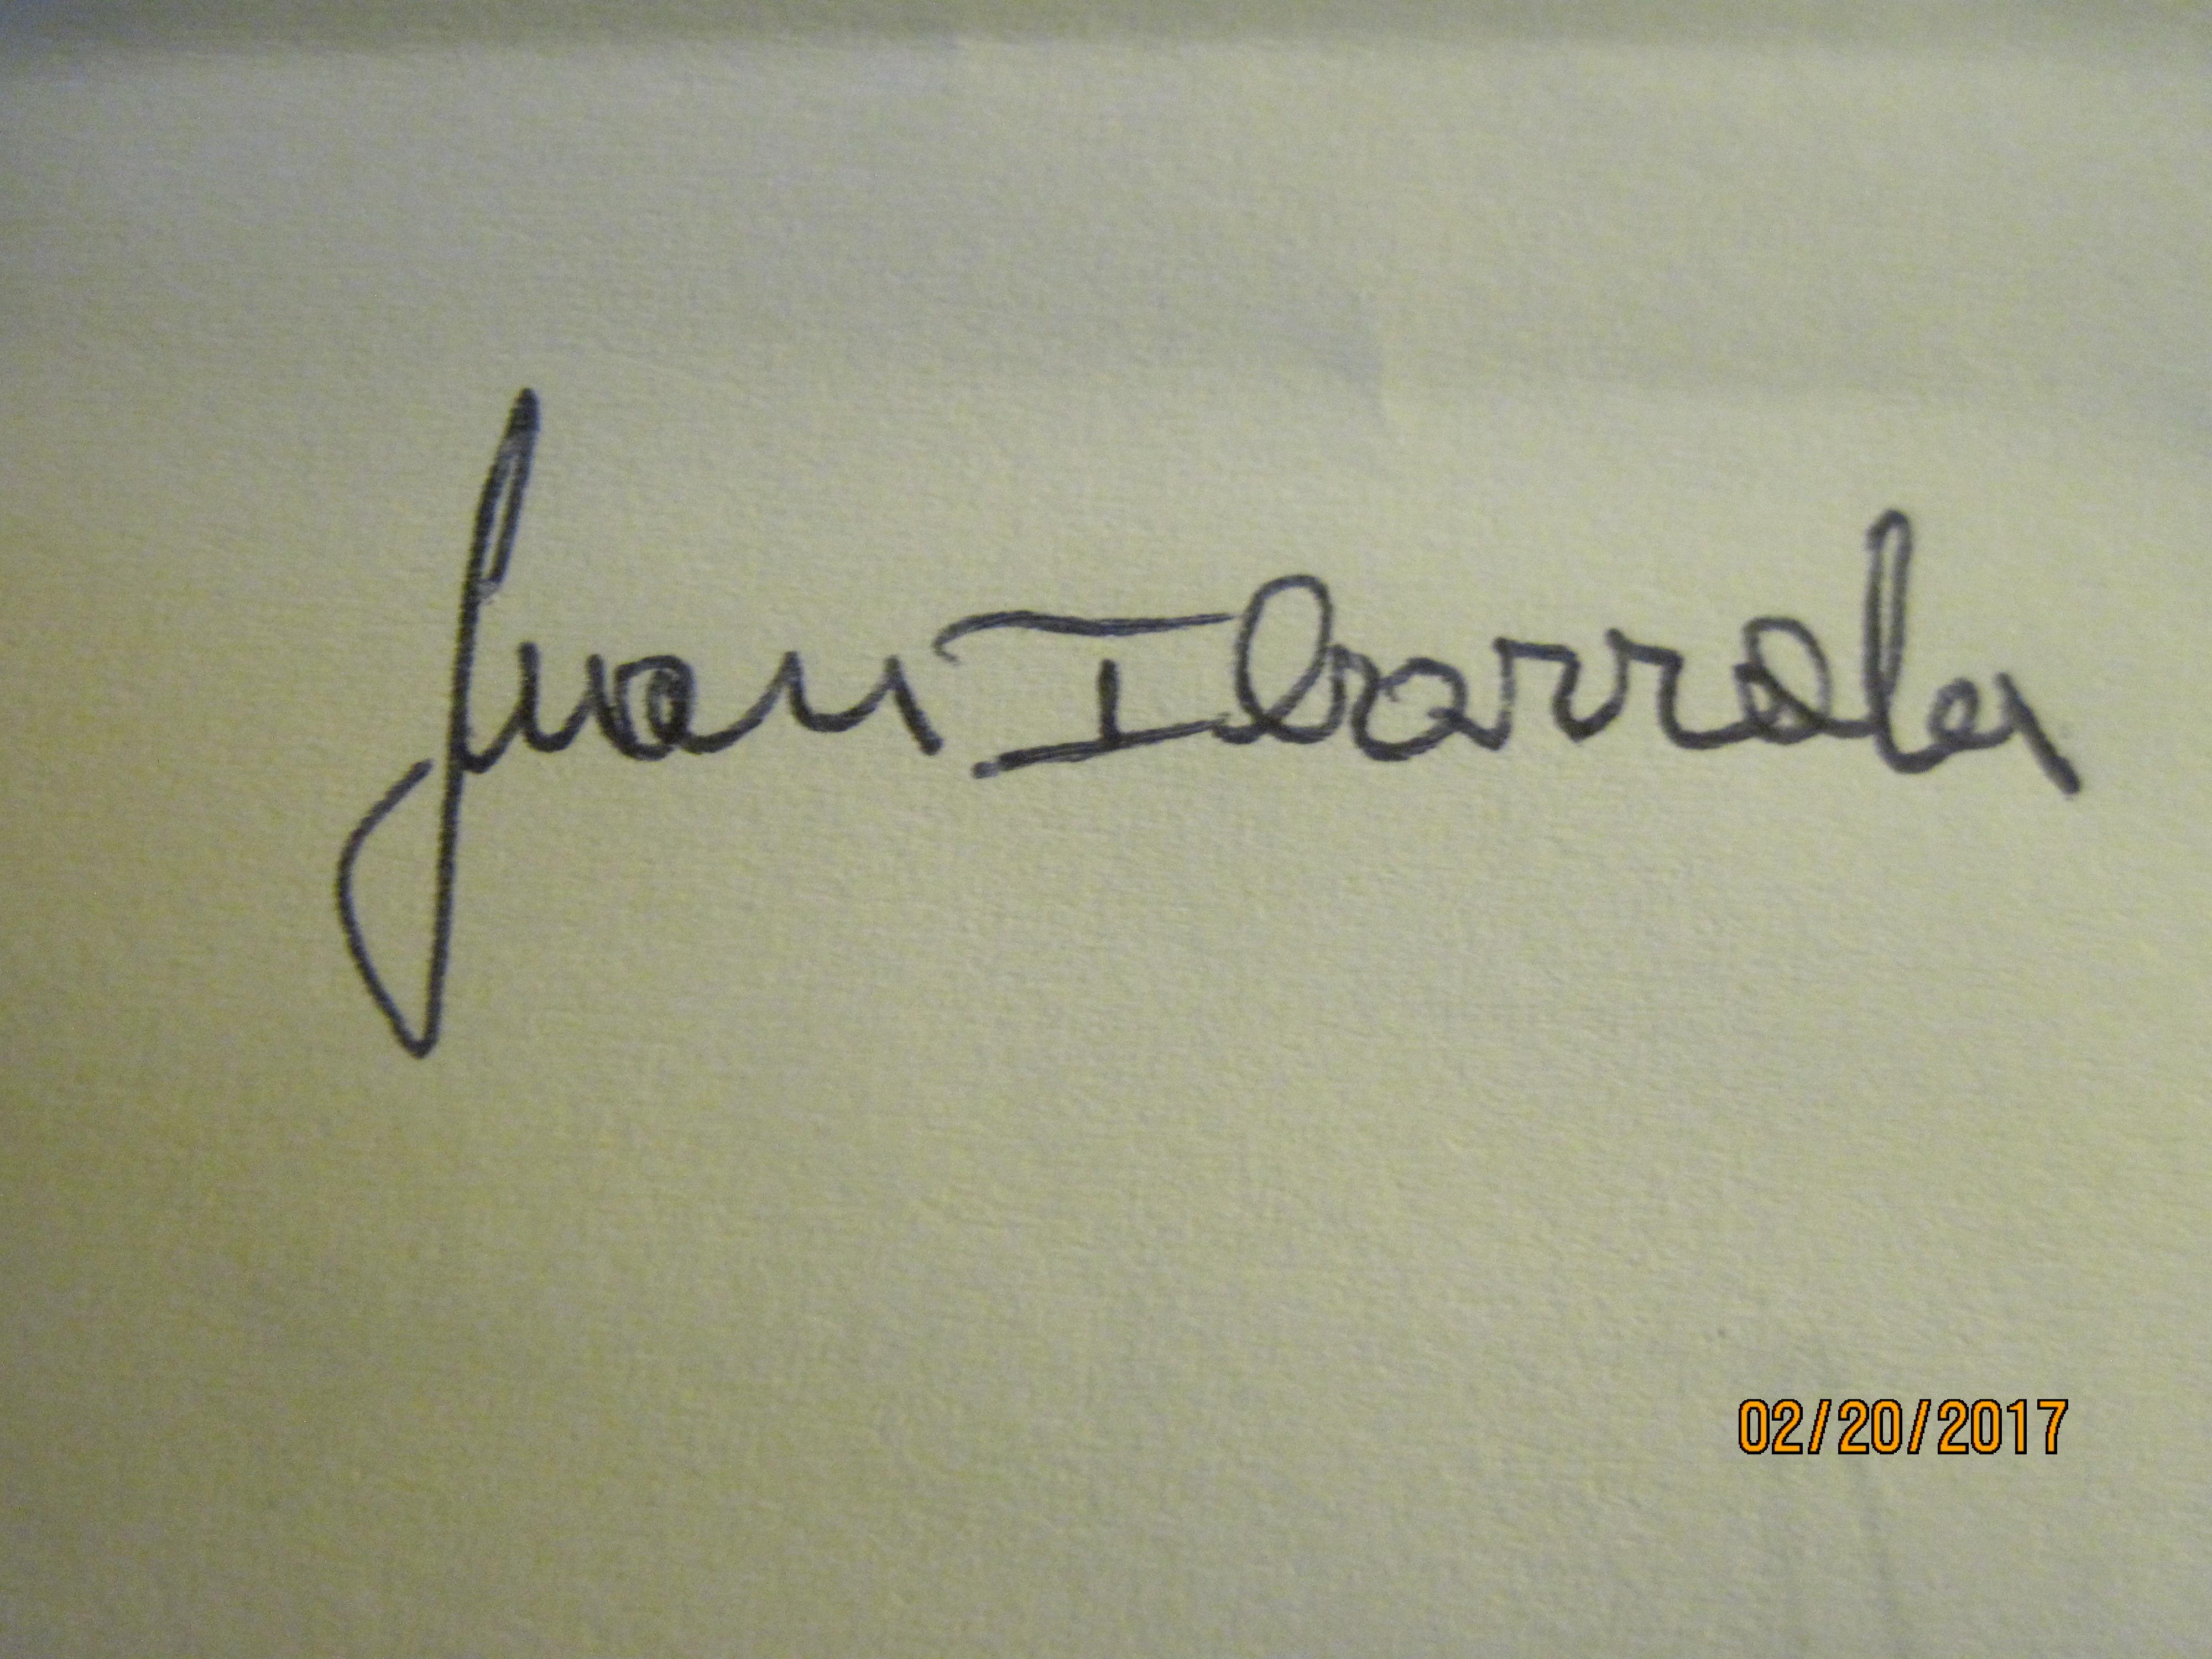 Artesania Ibarrola Quiroga's Signature